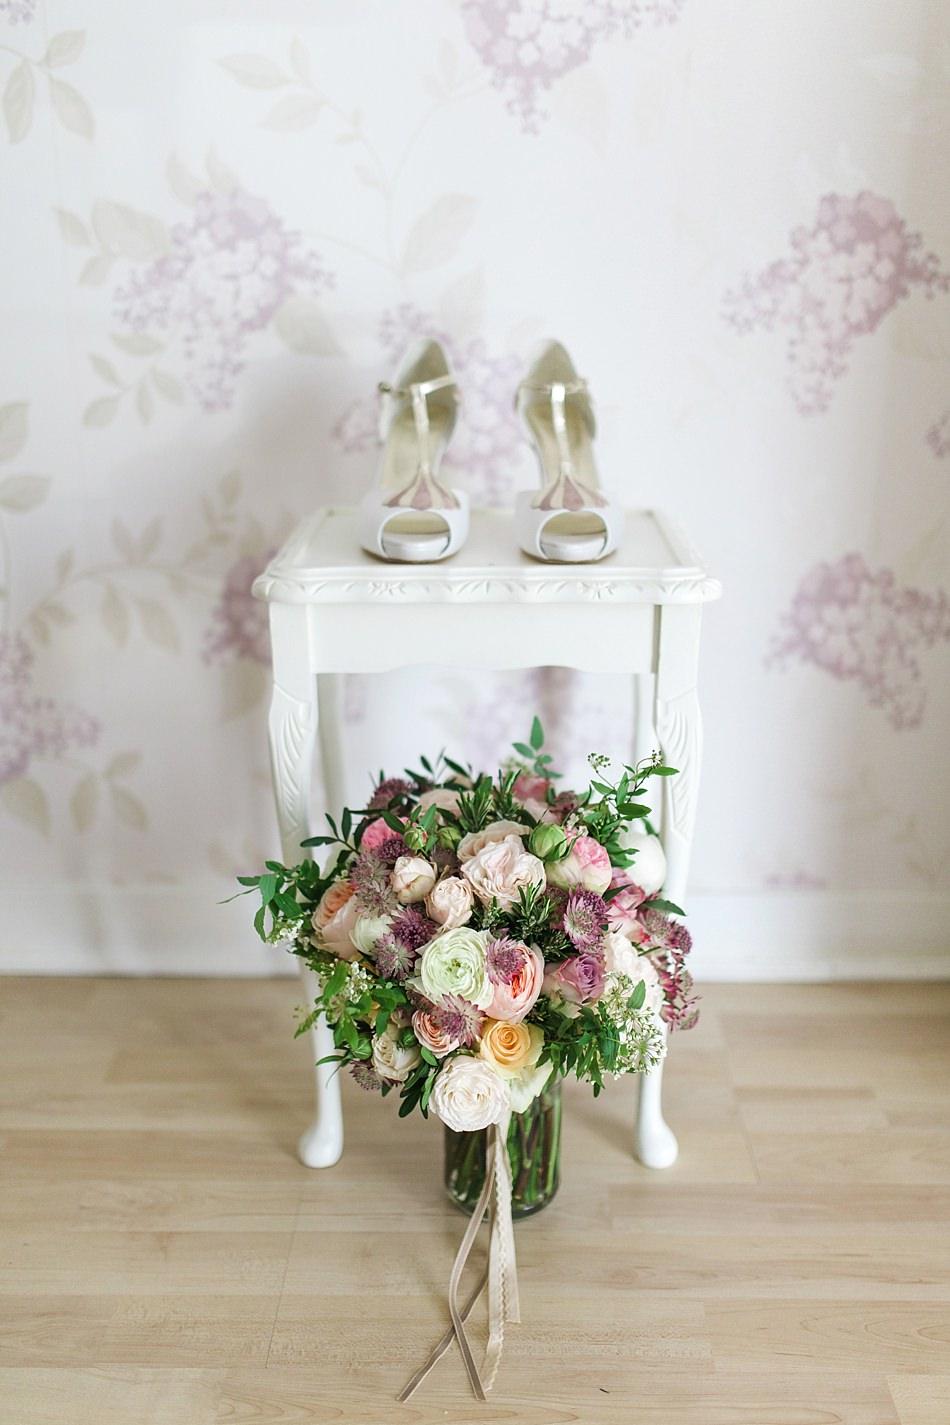 fine art wedding photographers glasgow scotland 3-2.jpg